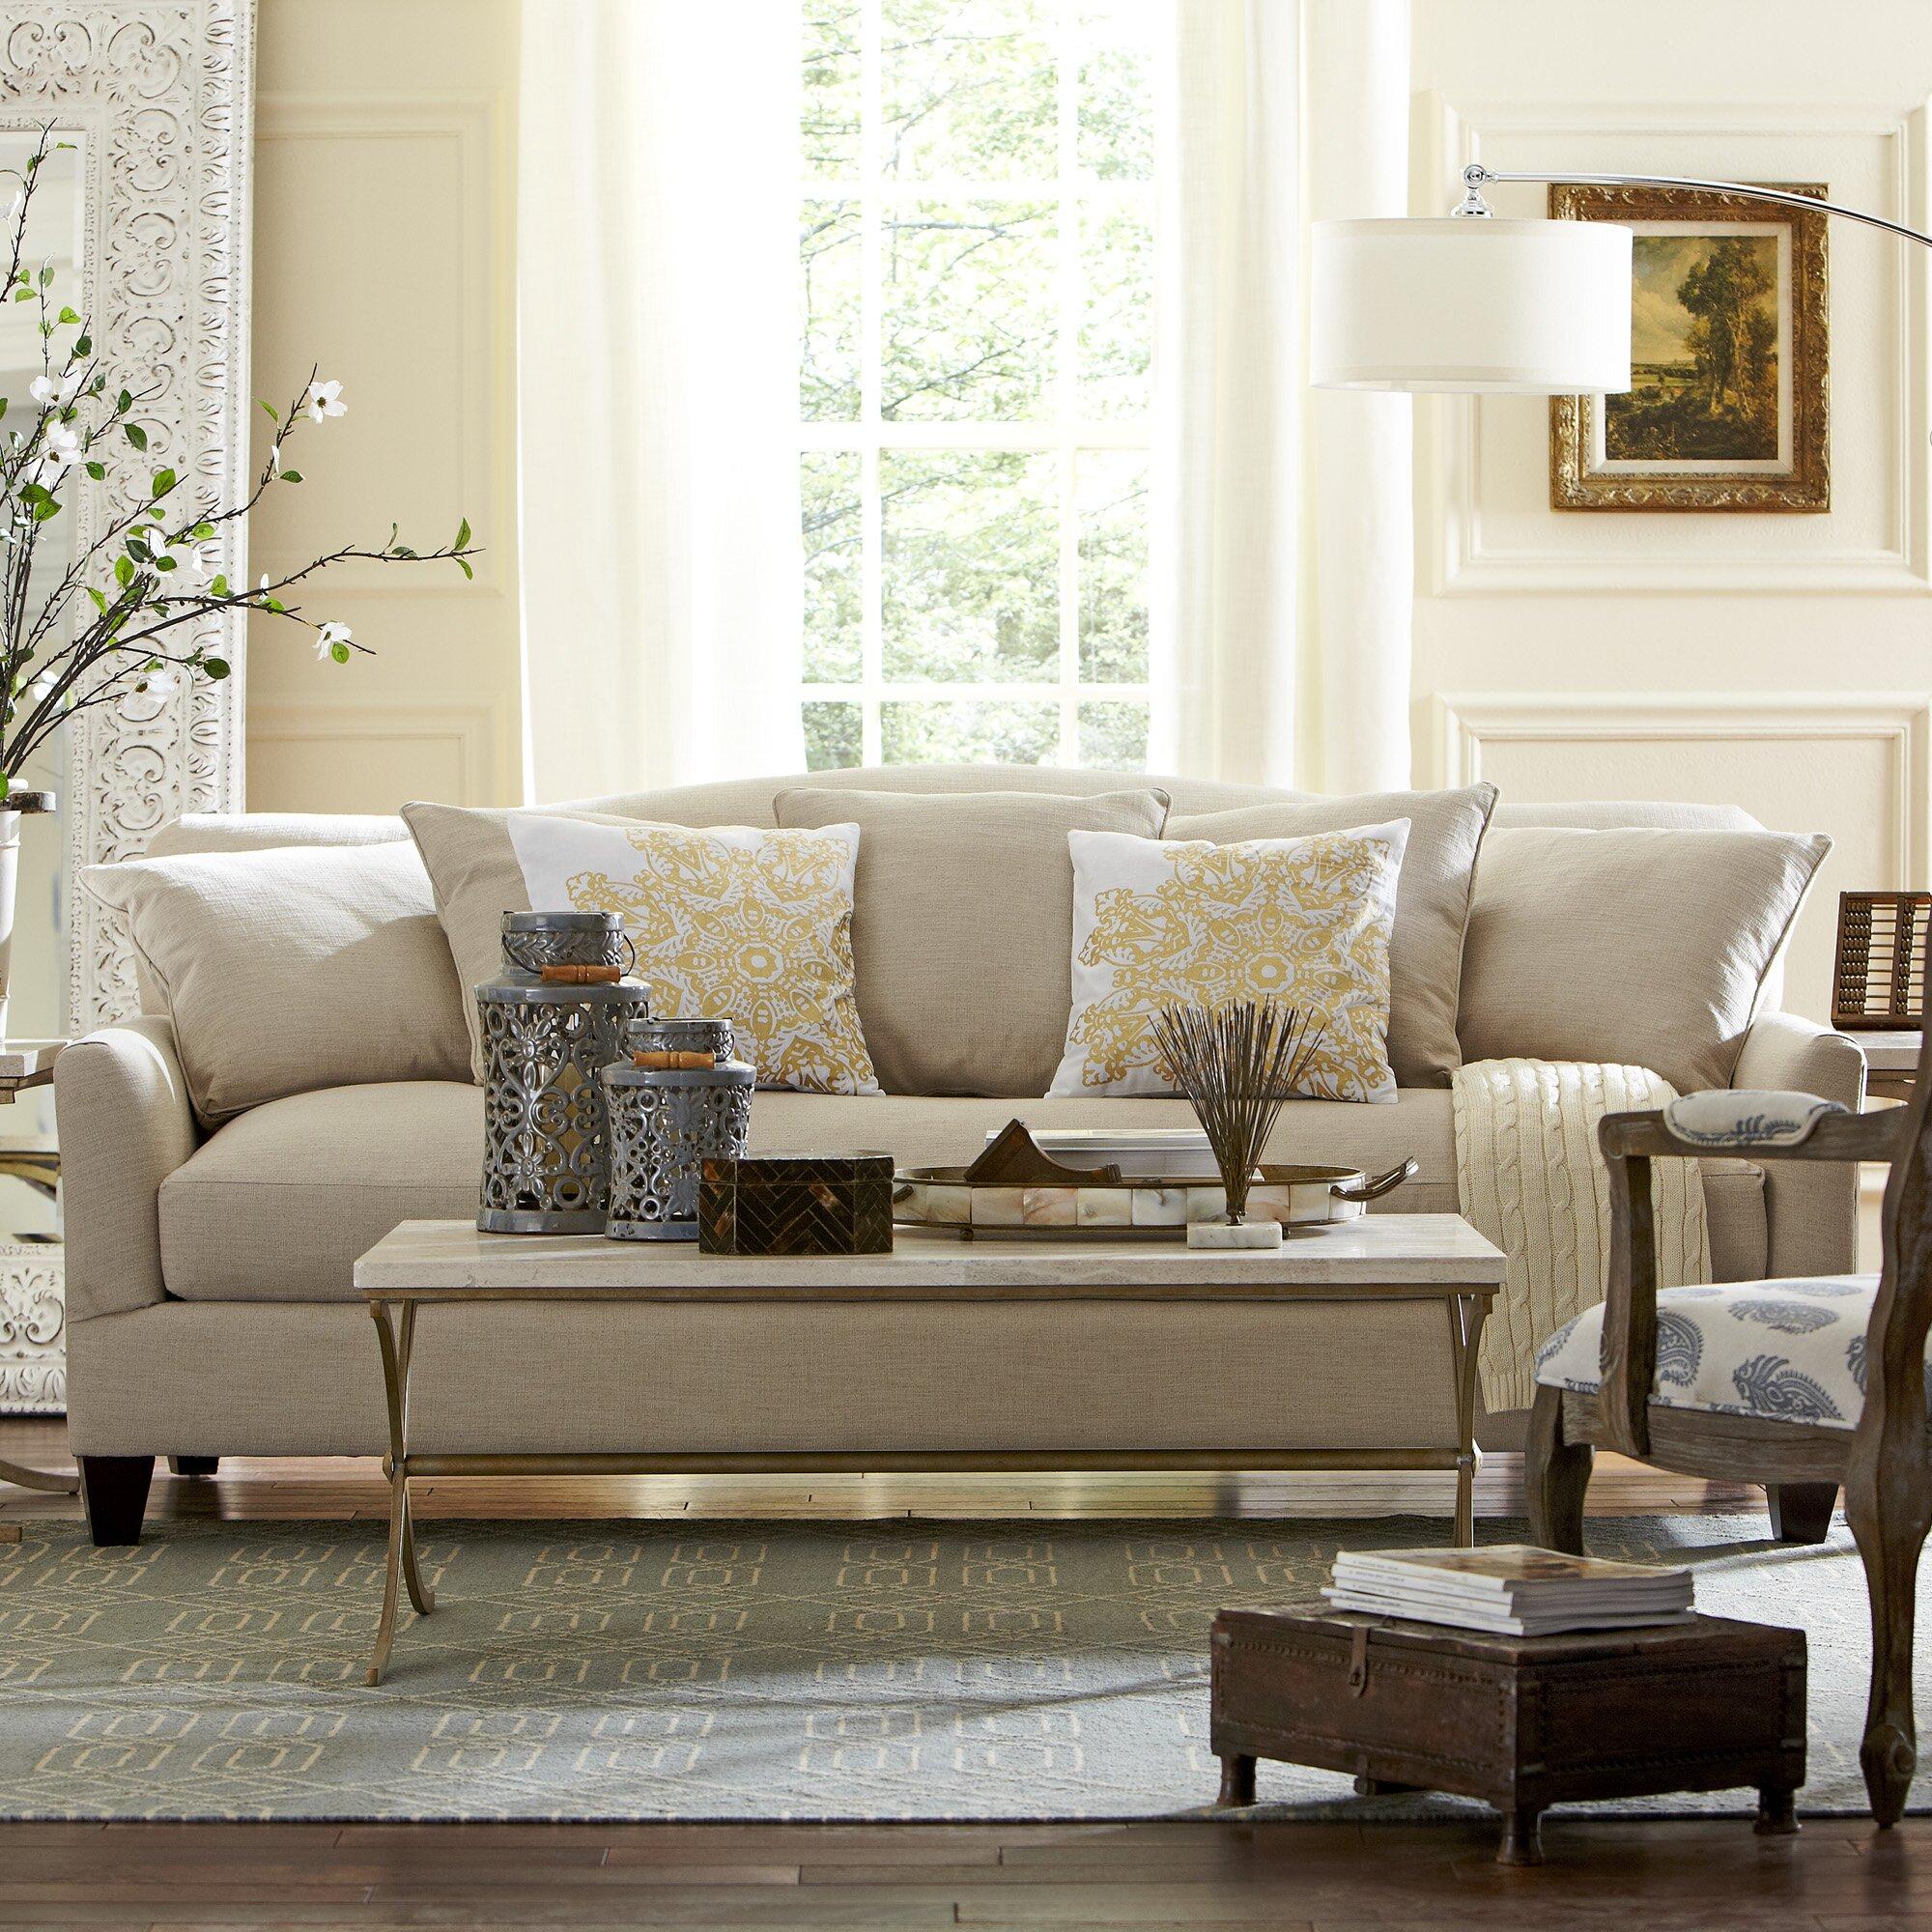 Fairchild Sofa amp Reviews Birch Lane : FairchildSofa from www.birchlane.com size 2000 x 2000 jpeg 782kB